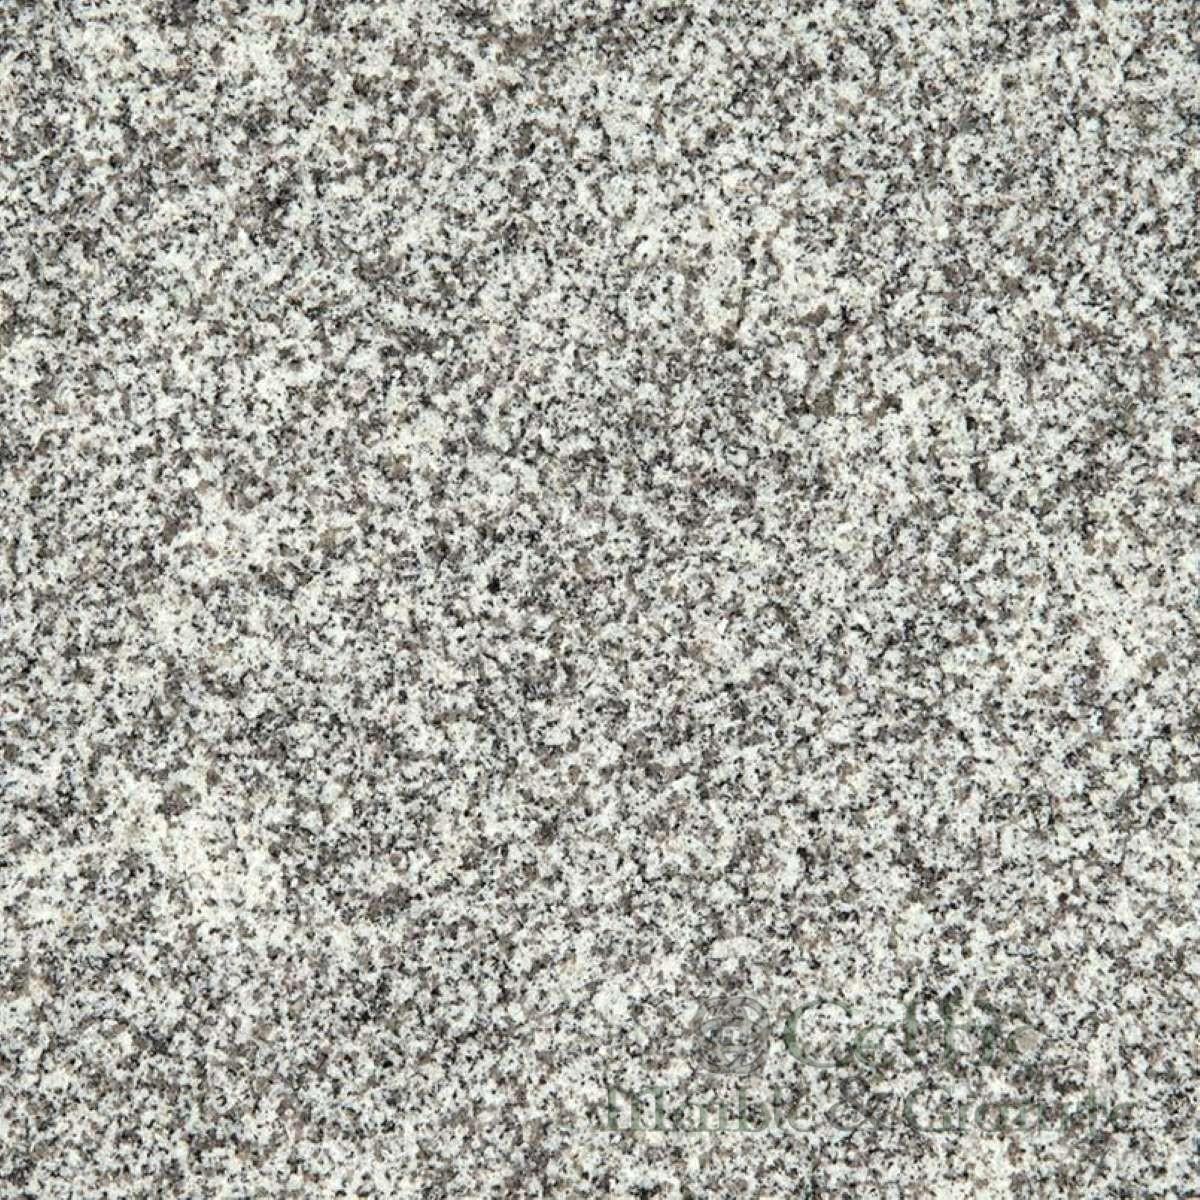 white-sparkle-granite_1